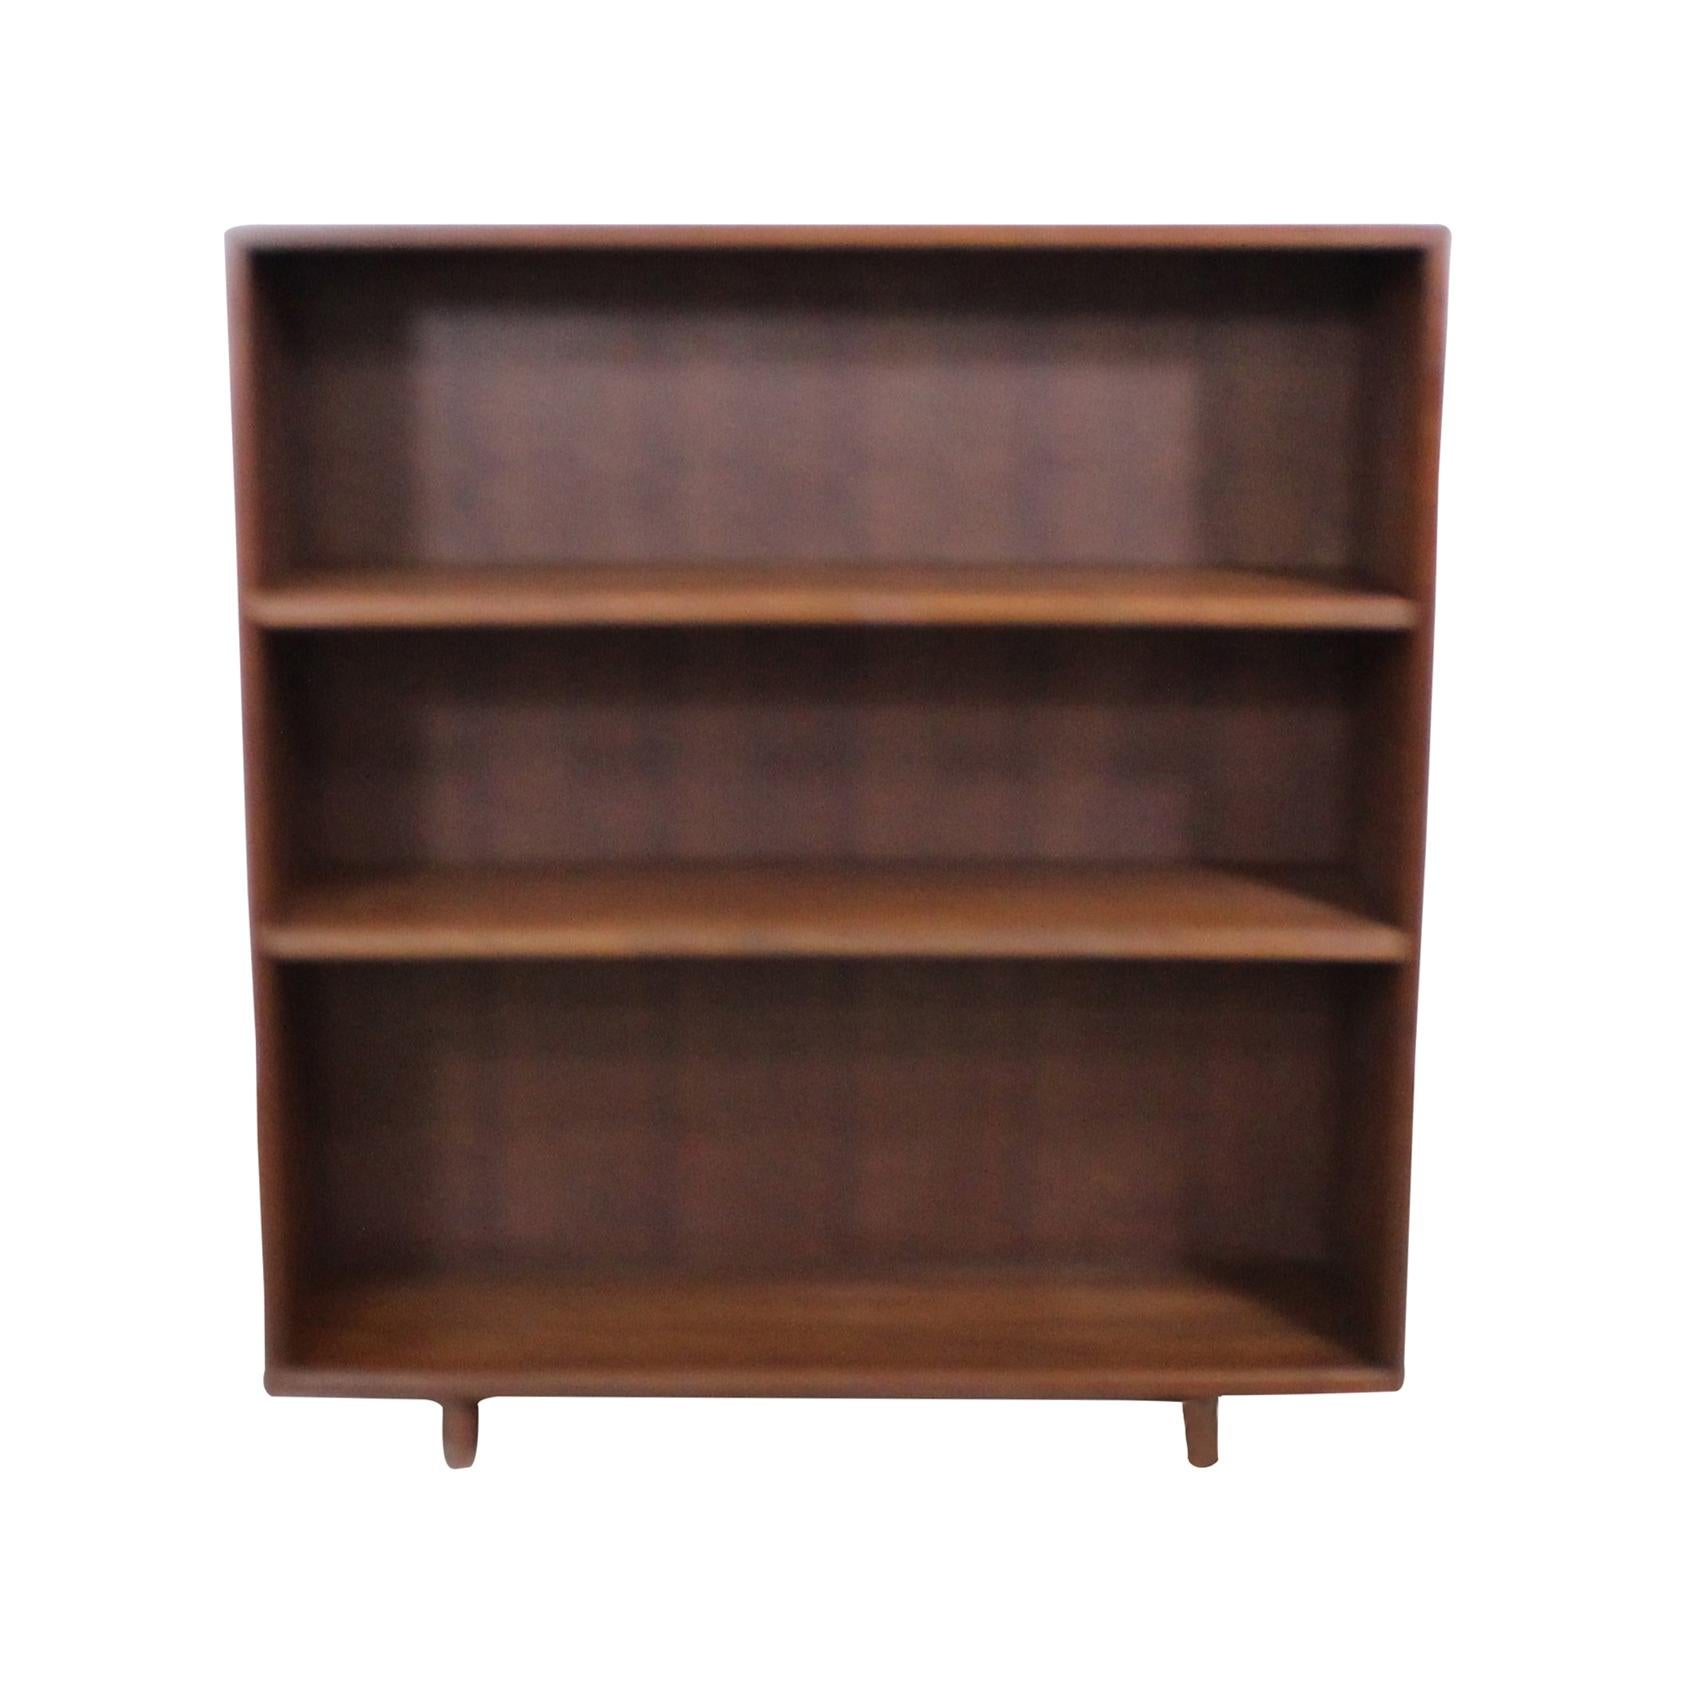 Midcentury Danish Modern Walnut Bookcase